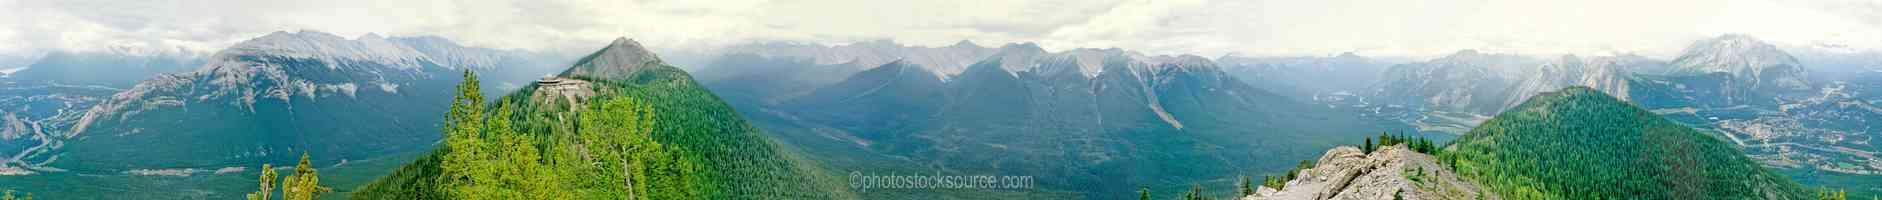 Banff from Sulfur Mt.